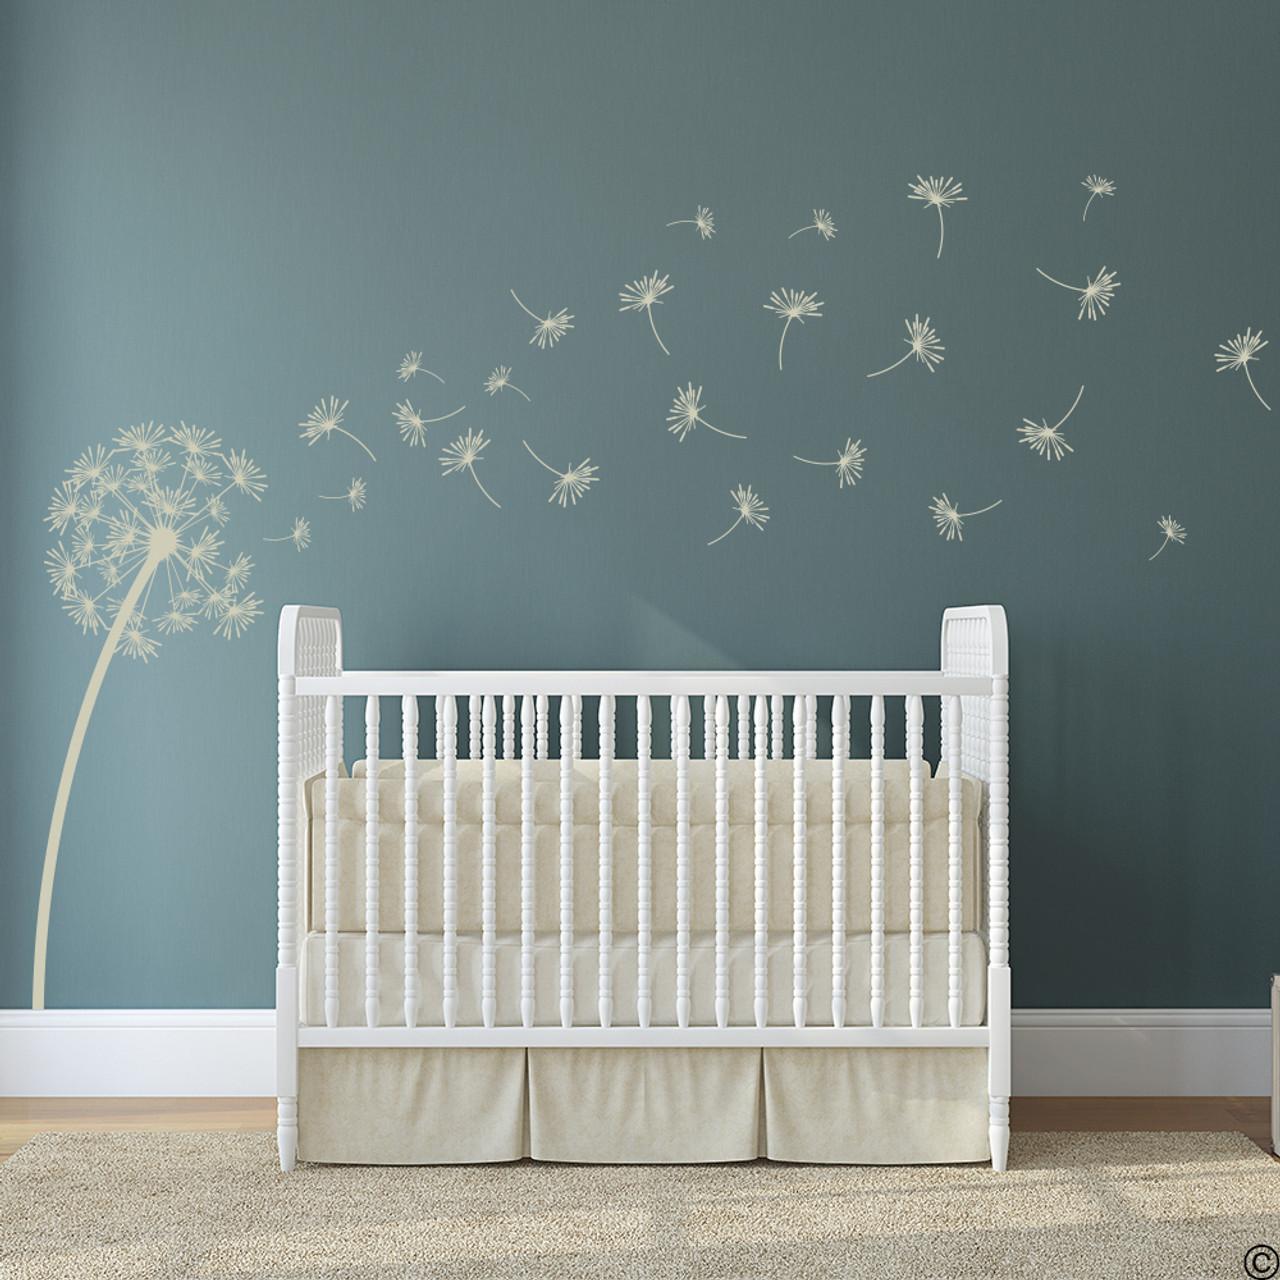 The Glinda dandelion vinyl wall decal in warm grey